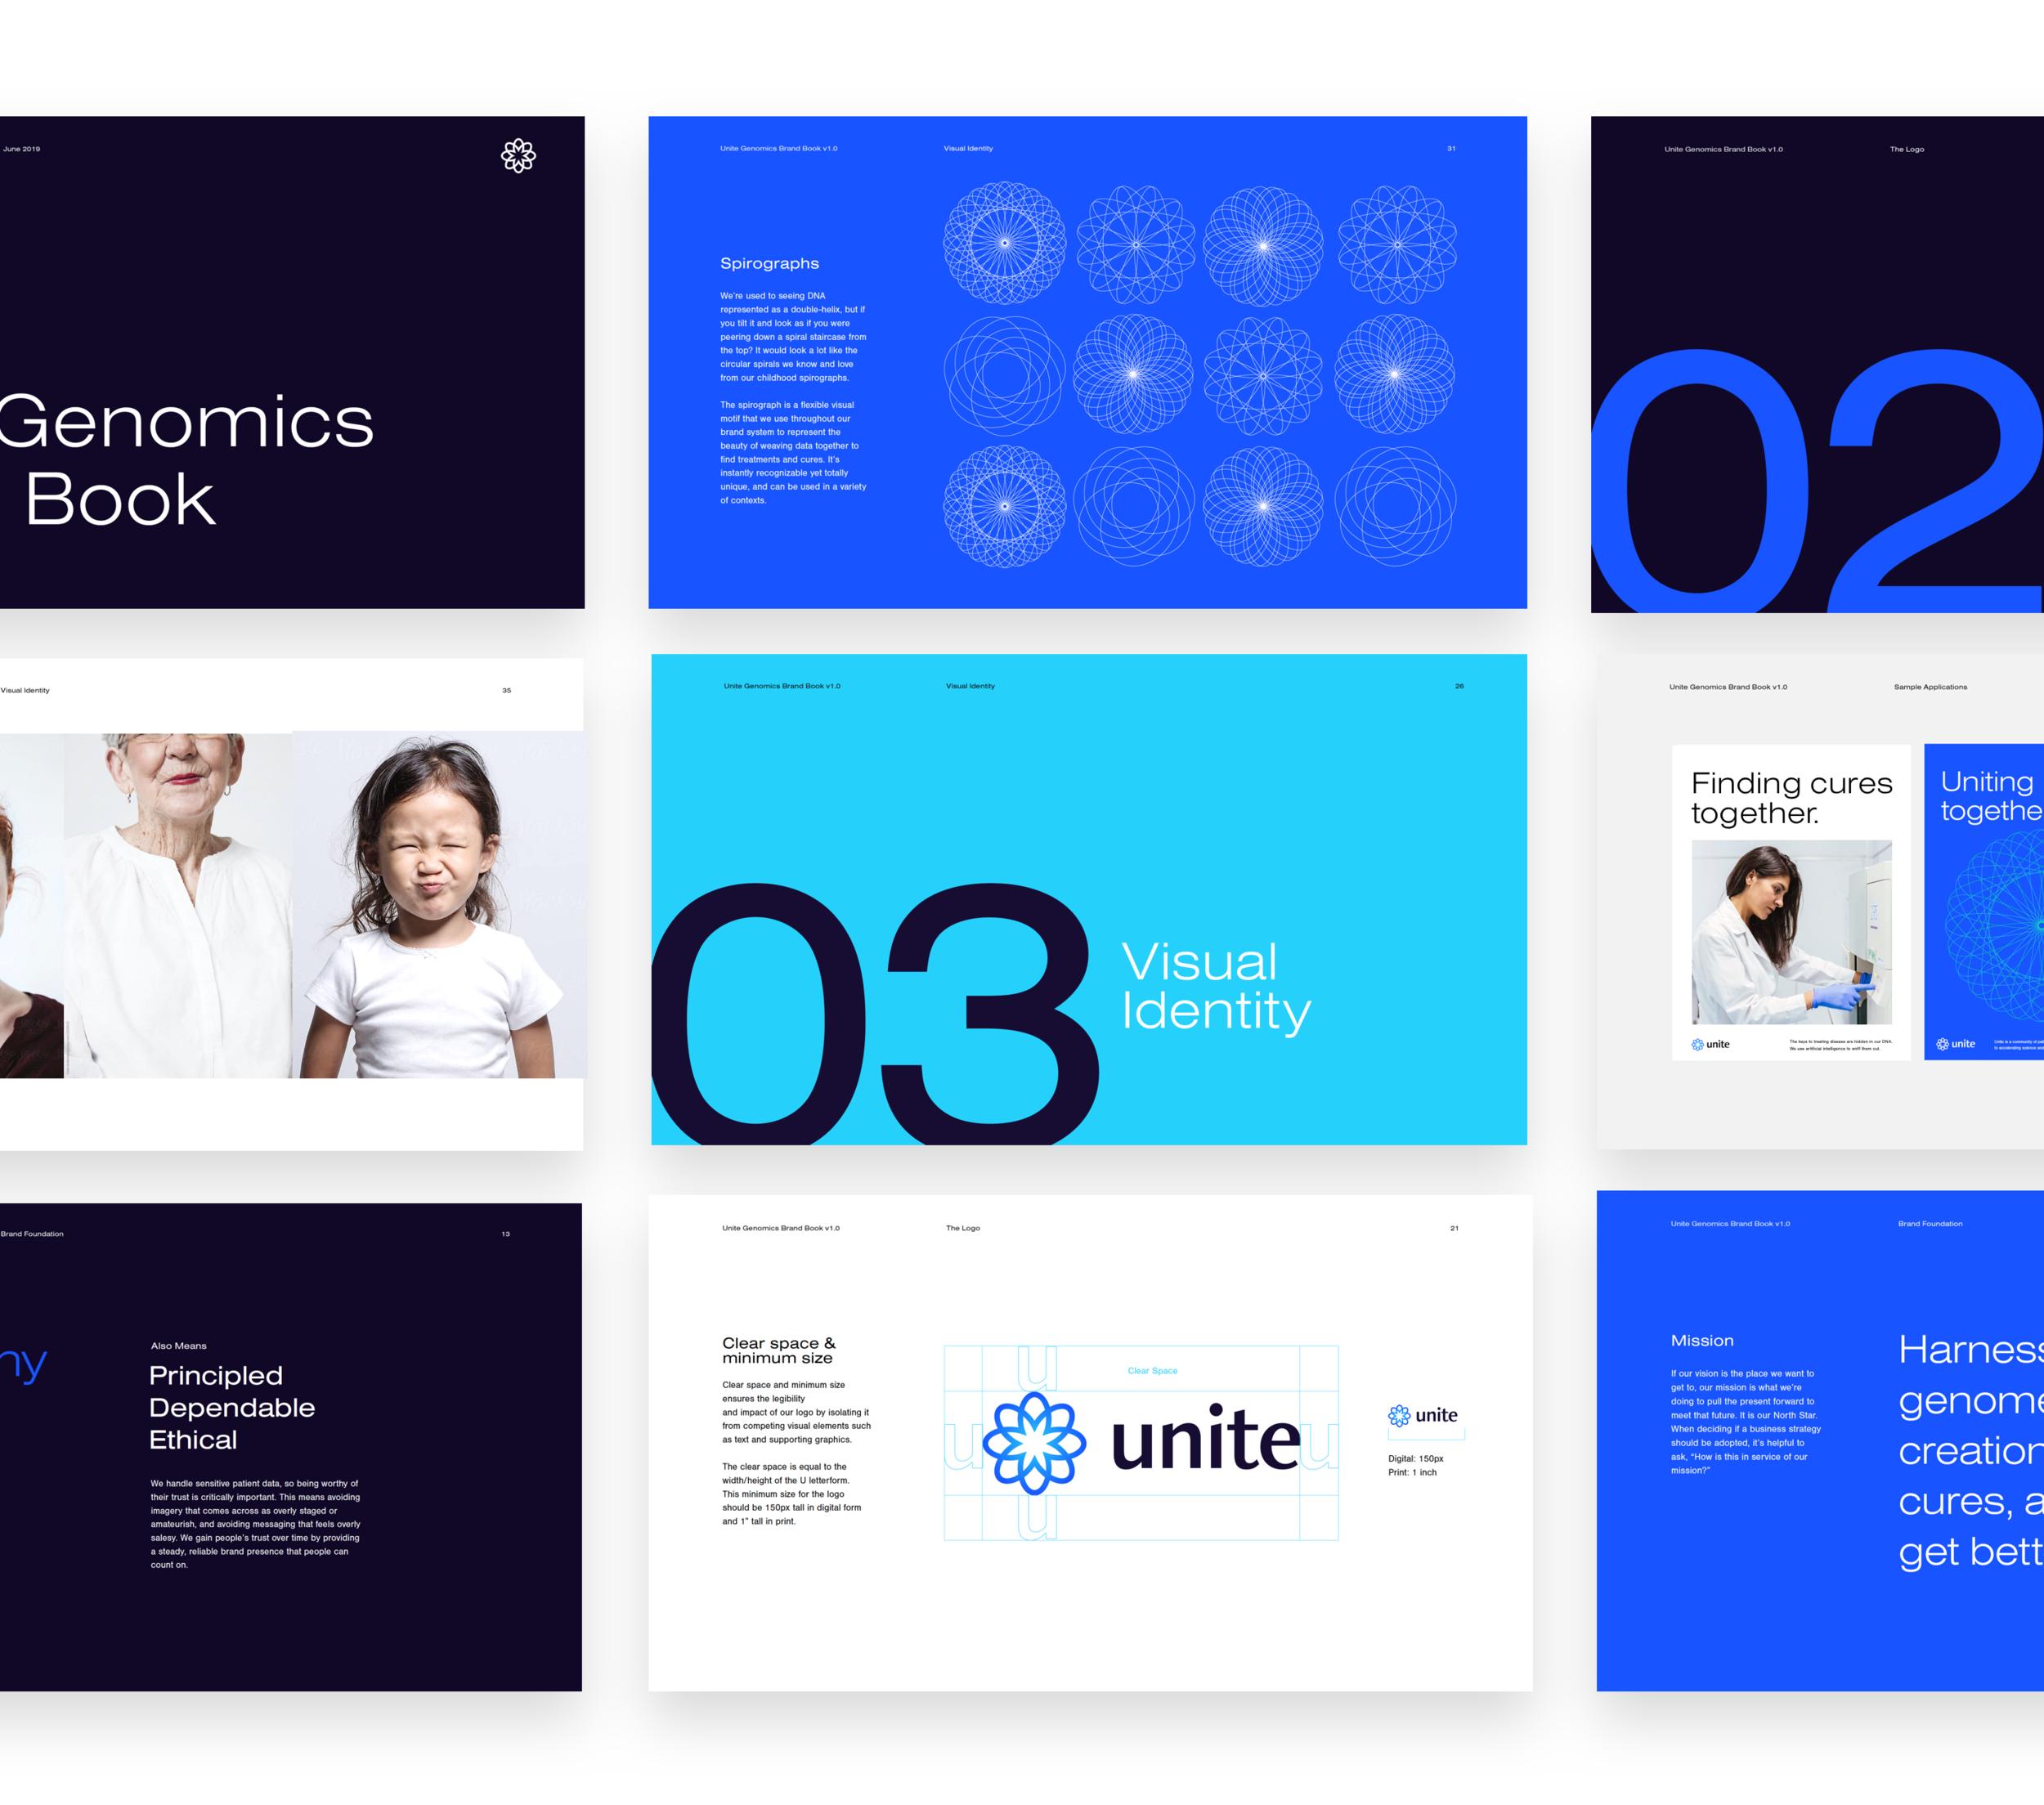 unite-genomics-branding-4.png